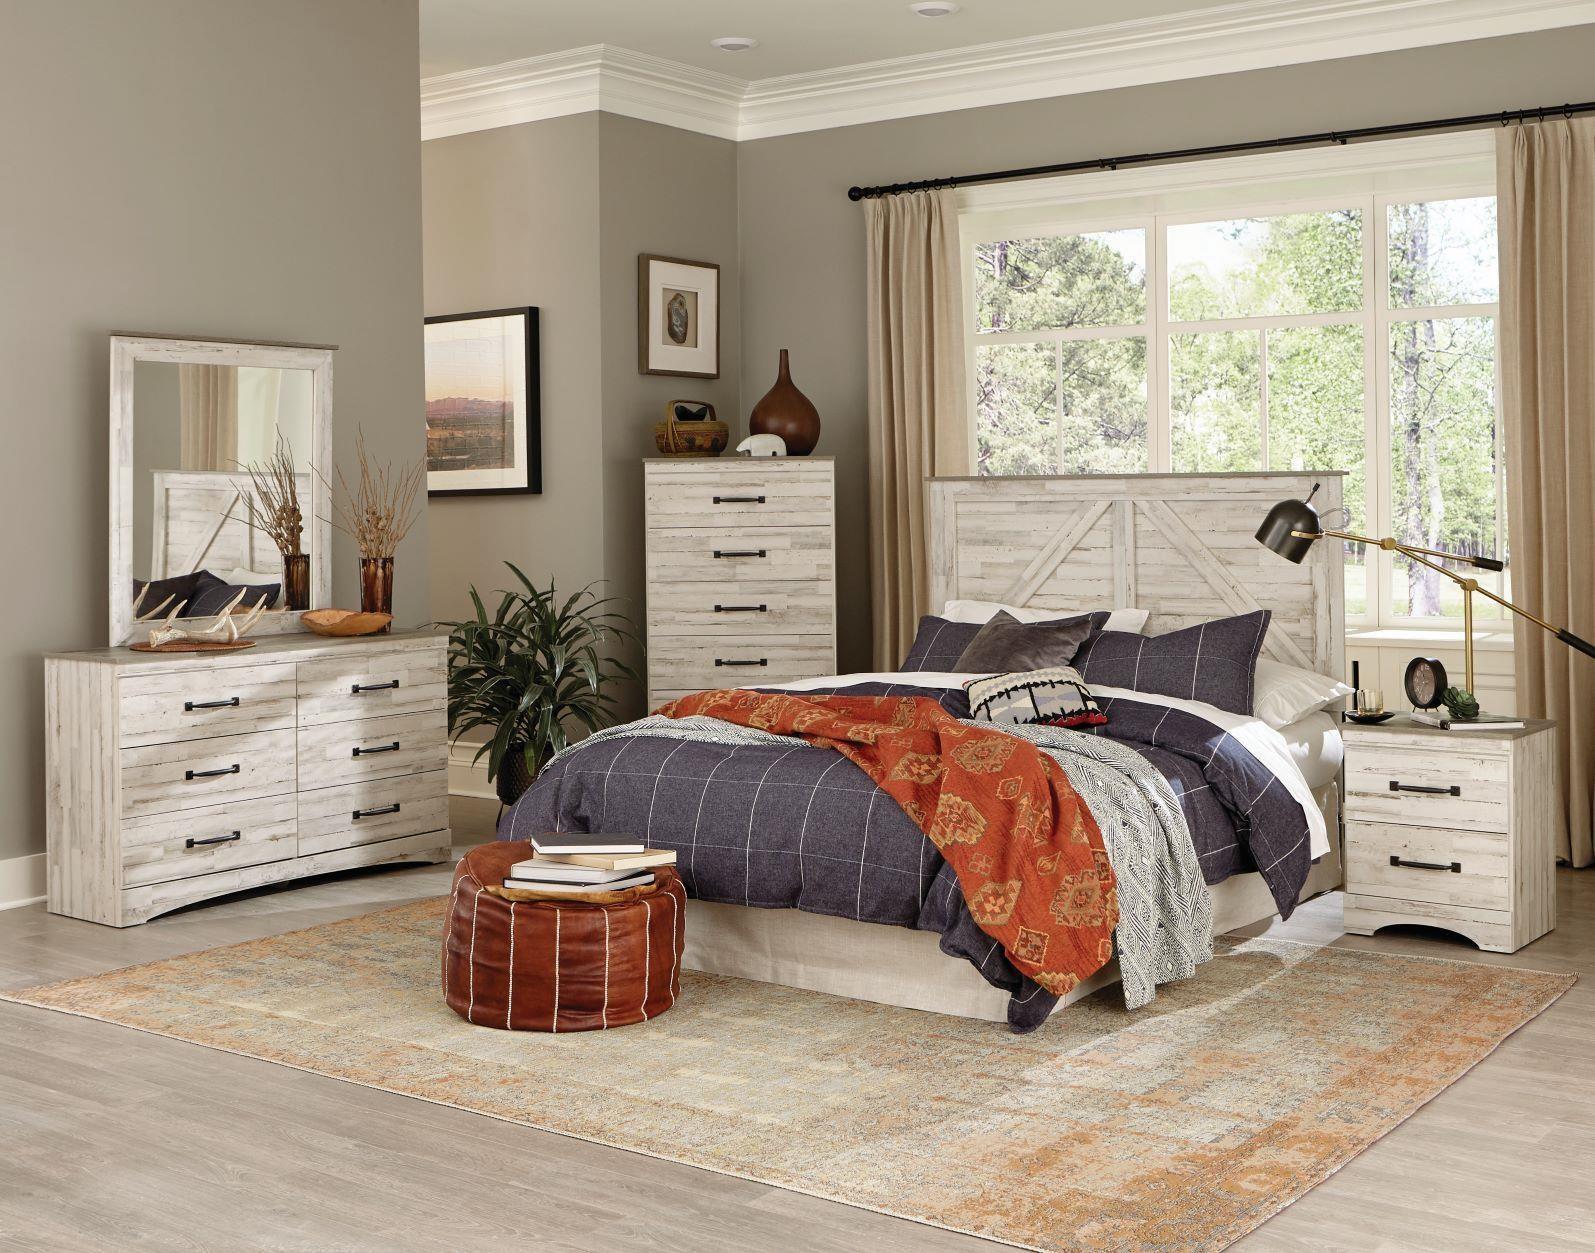 ASPEN KING HEADBOARD by Kith Furniture at Standard Furniture